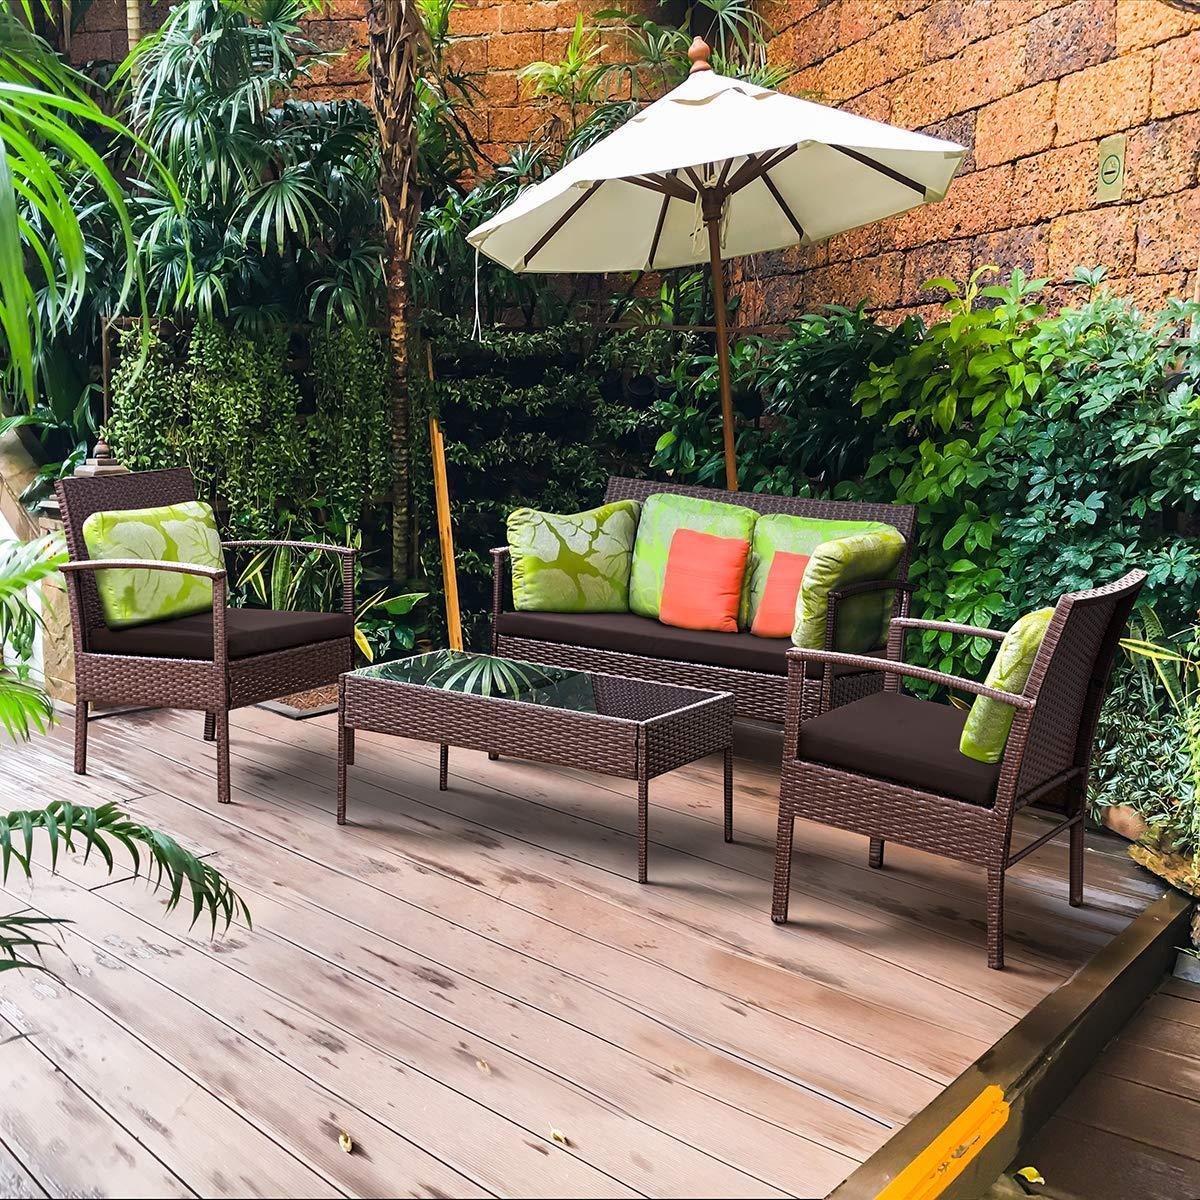 Tangkula 4 Piece Outdoor Furniture Set Patio Garden Pool Lawn Rattan Wicker Loveseat Sofa Cushioned Seat & Glass Top Coffee Table Modern Wicker Rattan Conversation Set (Brown)